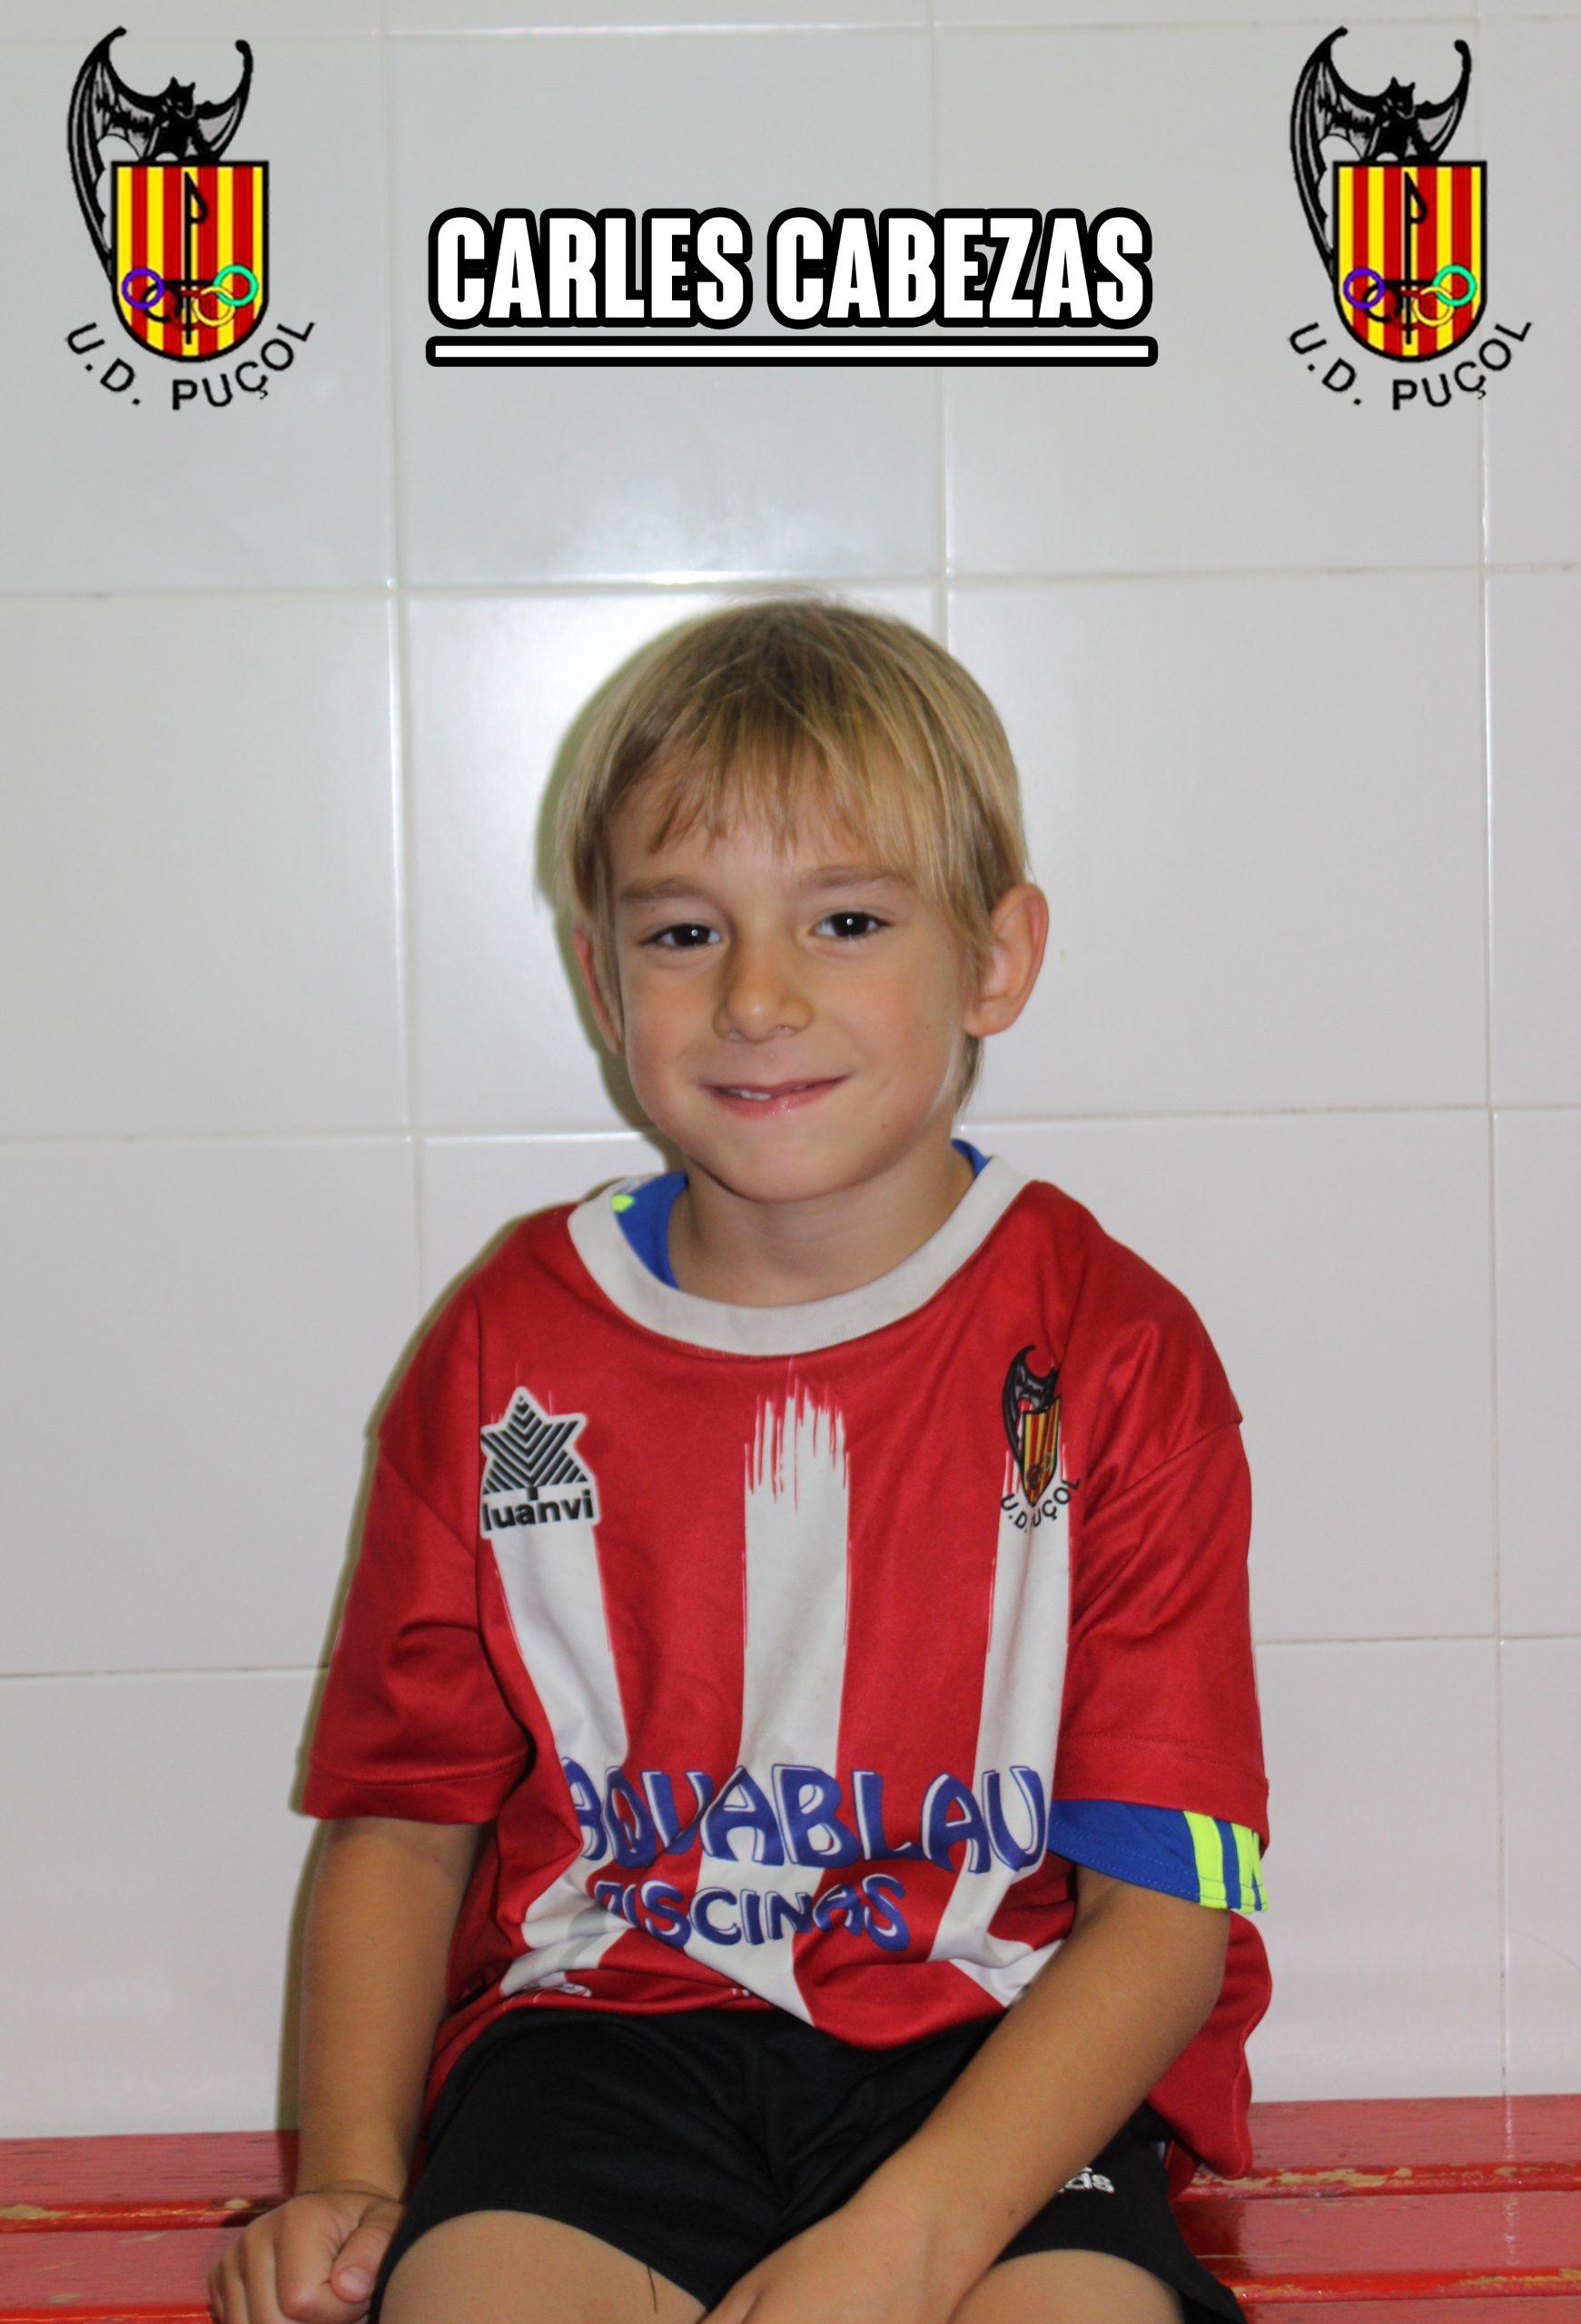 Carles Cabezas